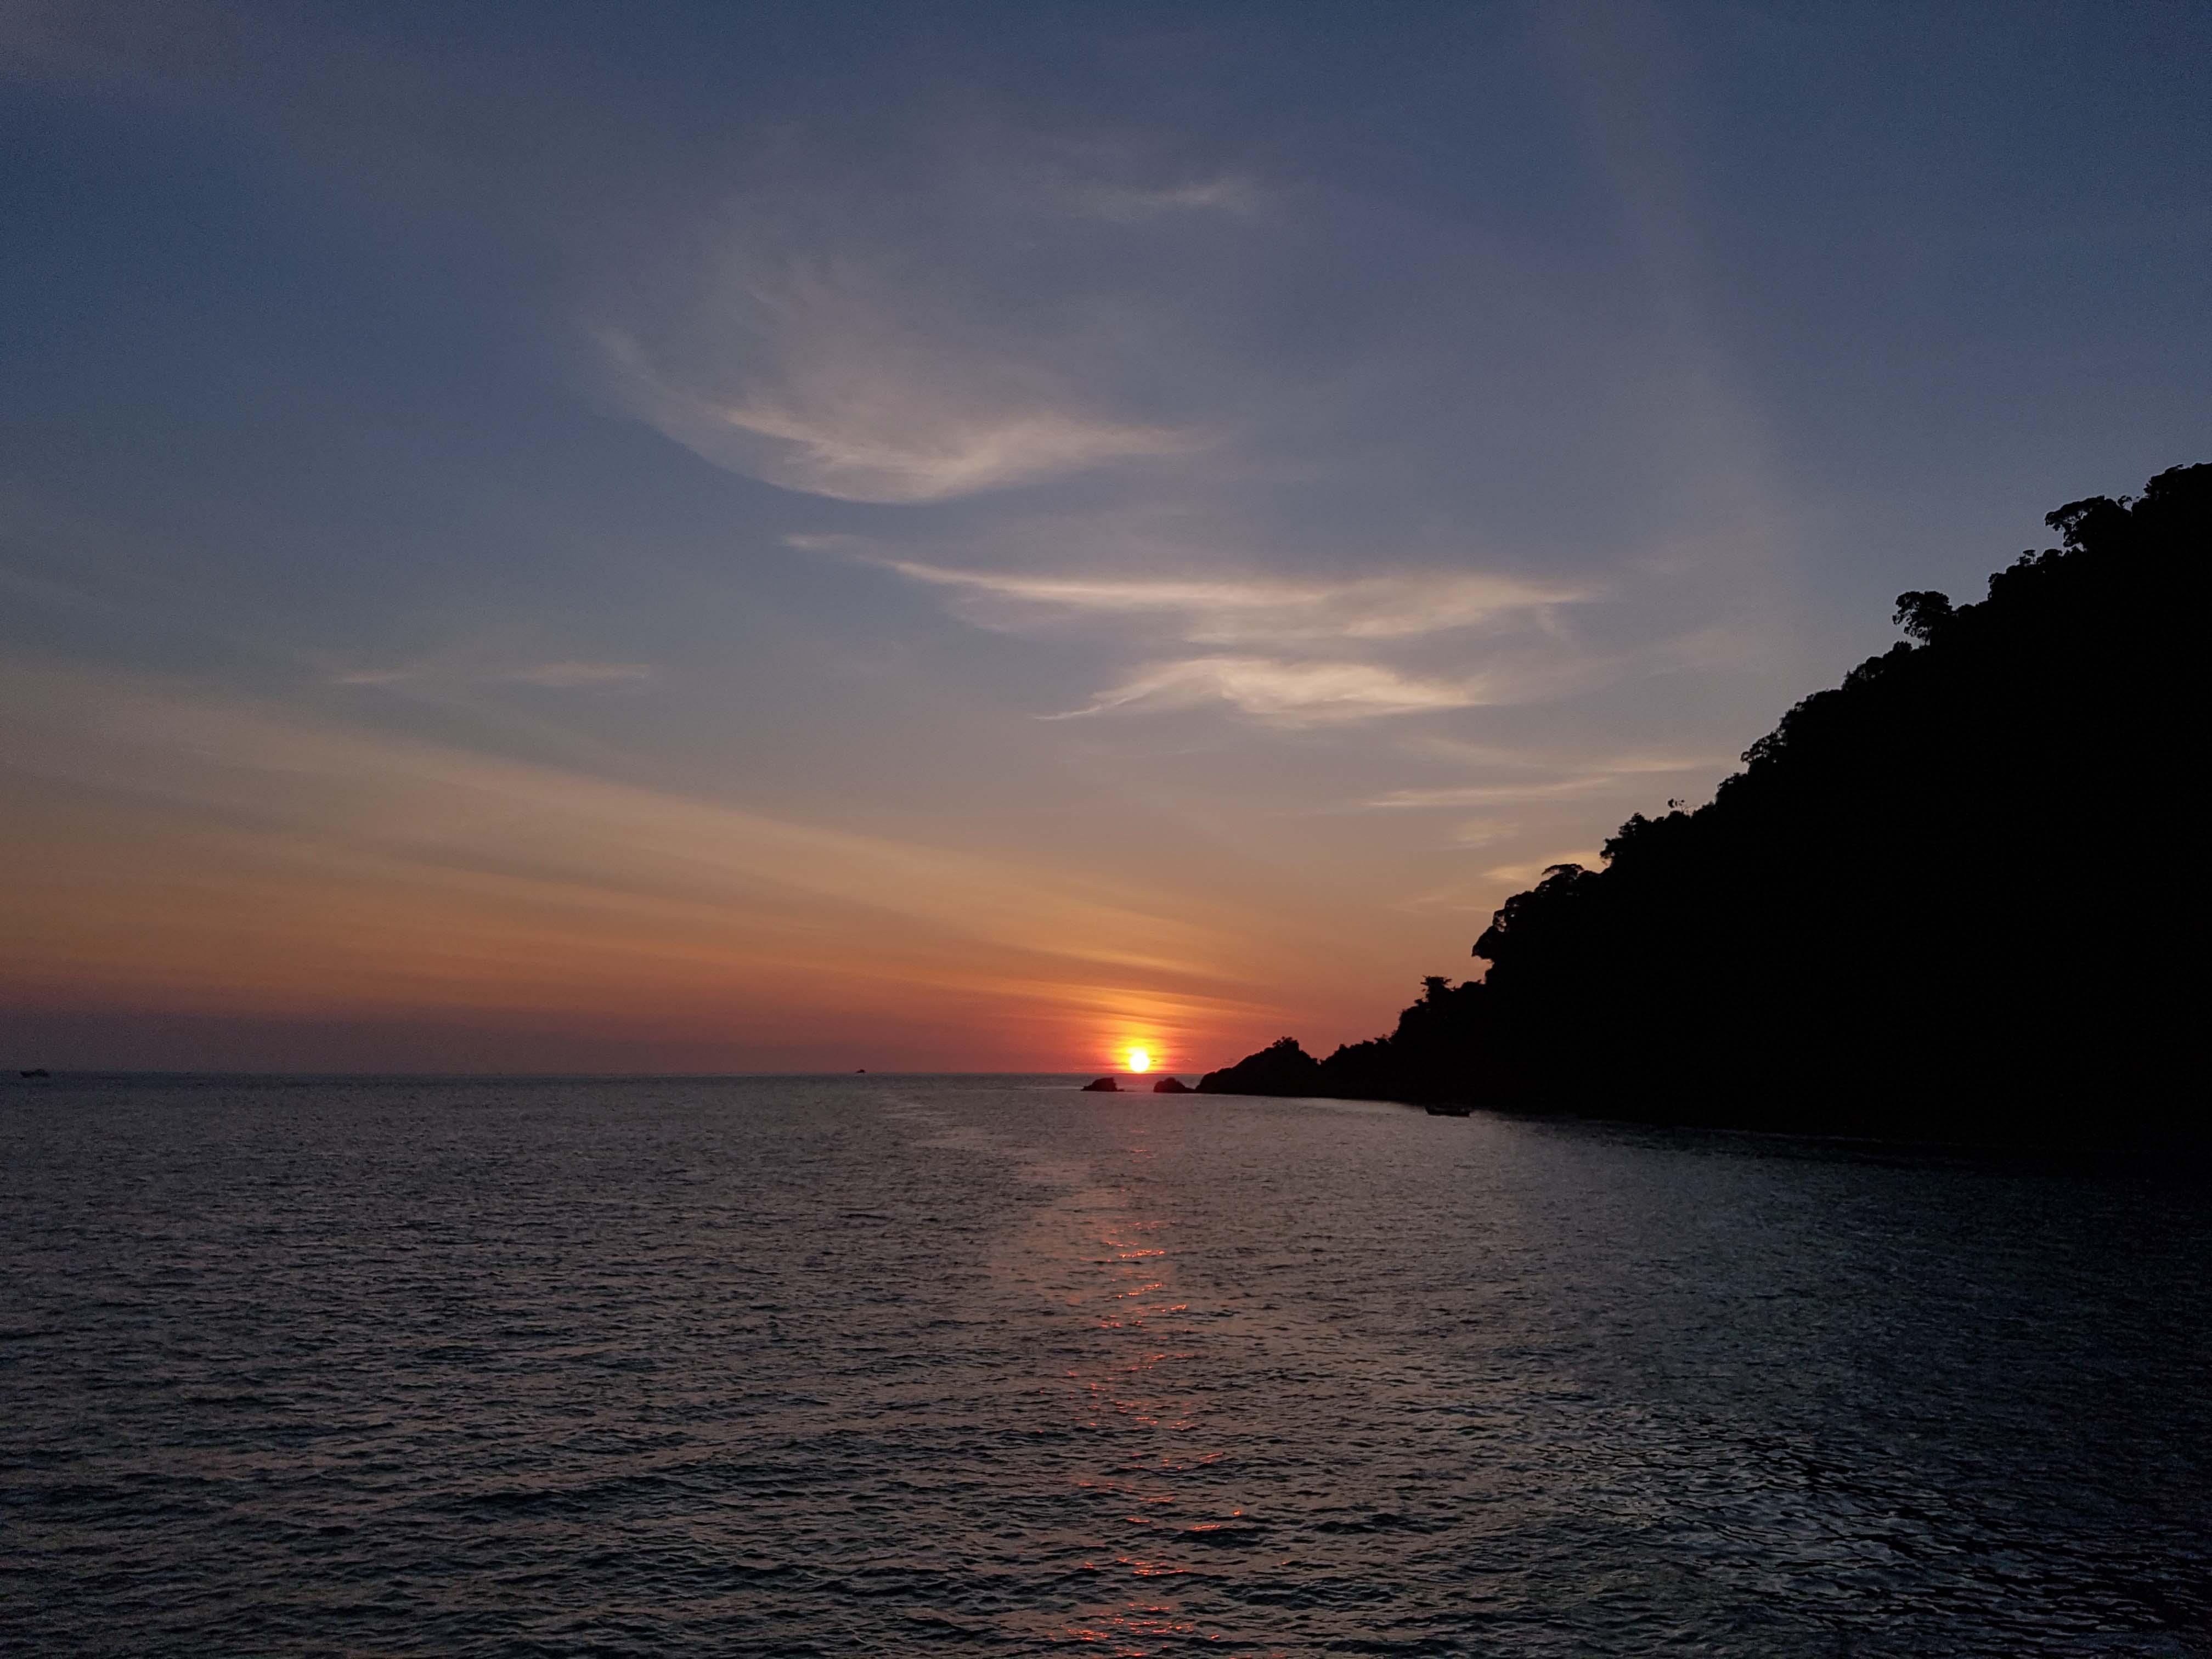 Chasing sunsets - Langkawi, Malaysia